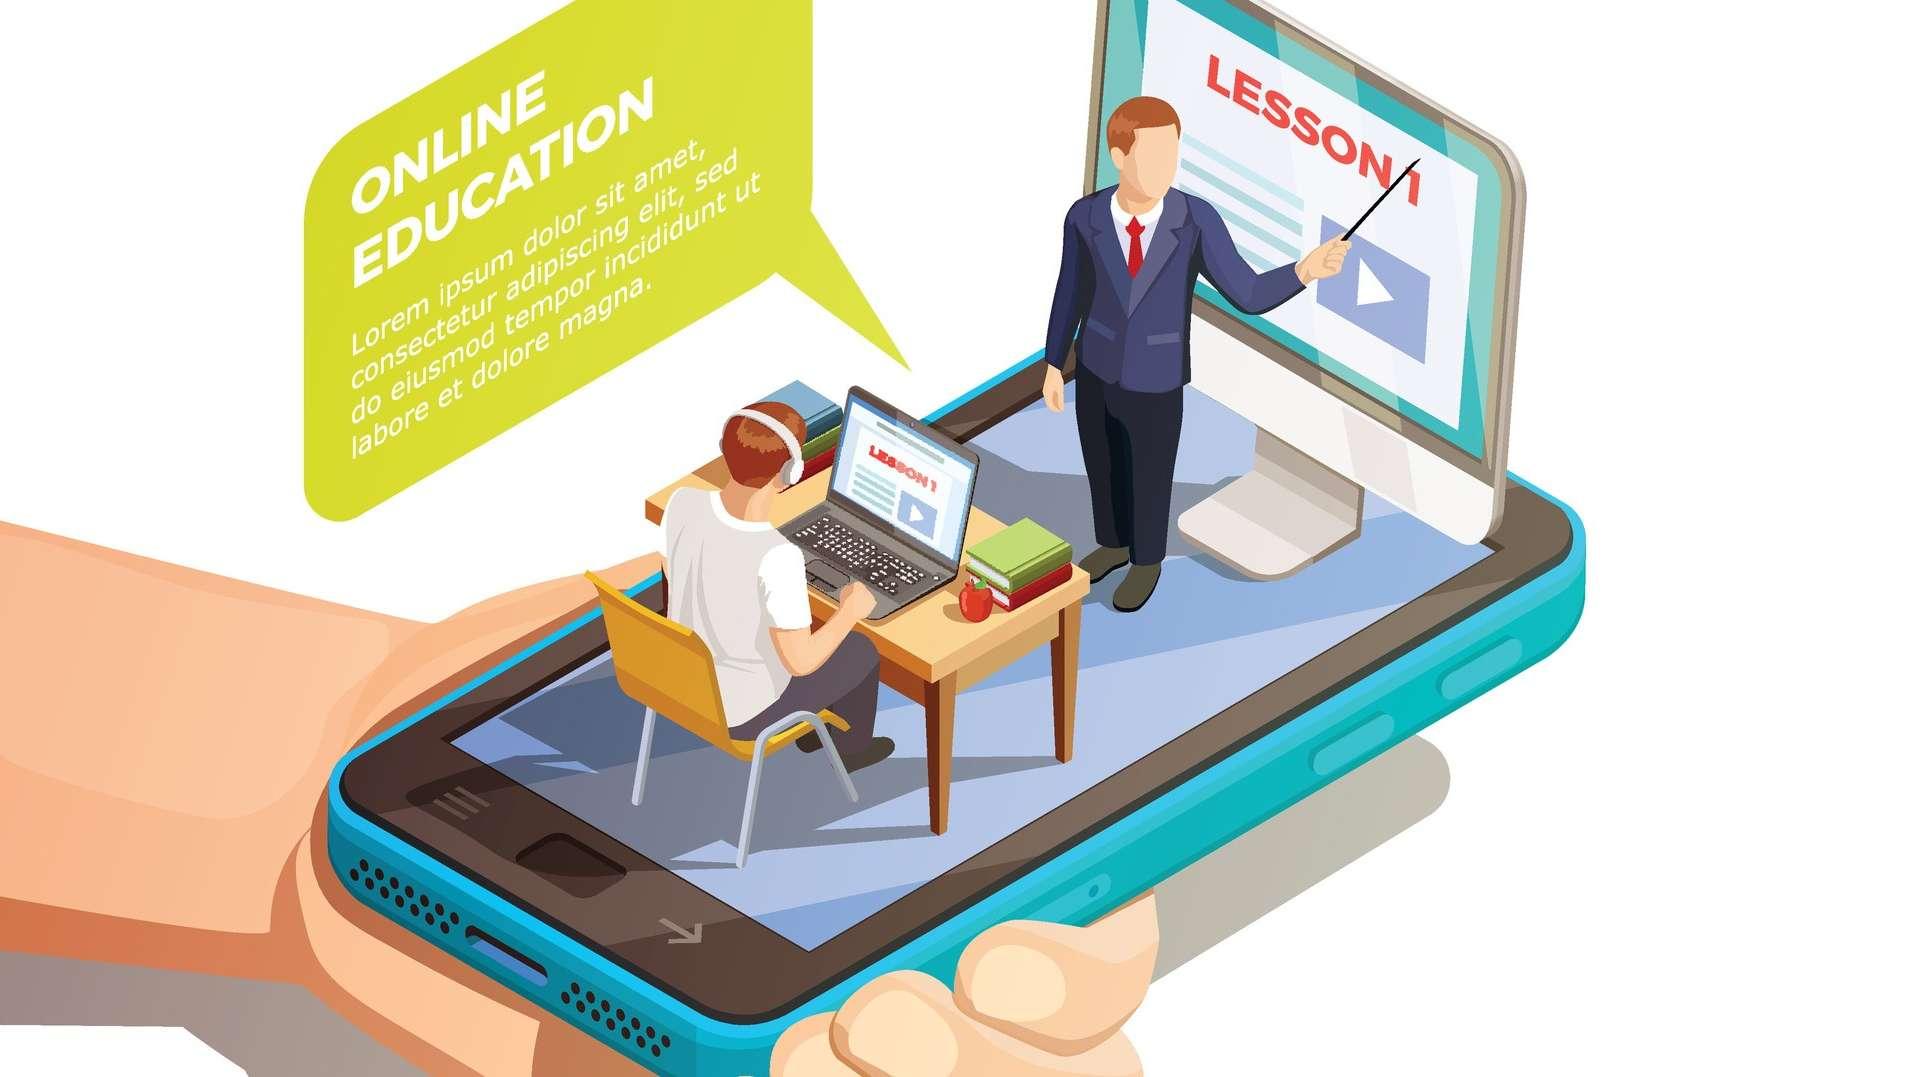 Cartoon of a teacher teaching a student, sitting on top of a cell phone screen